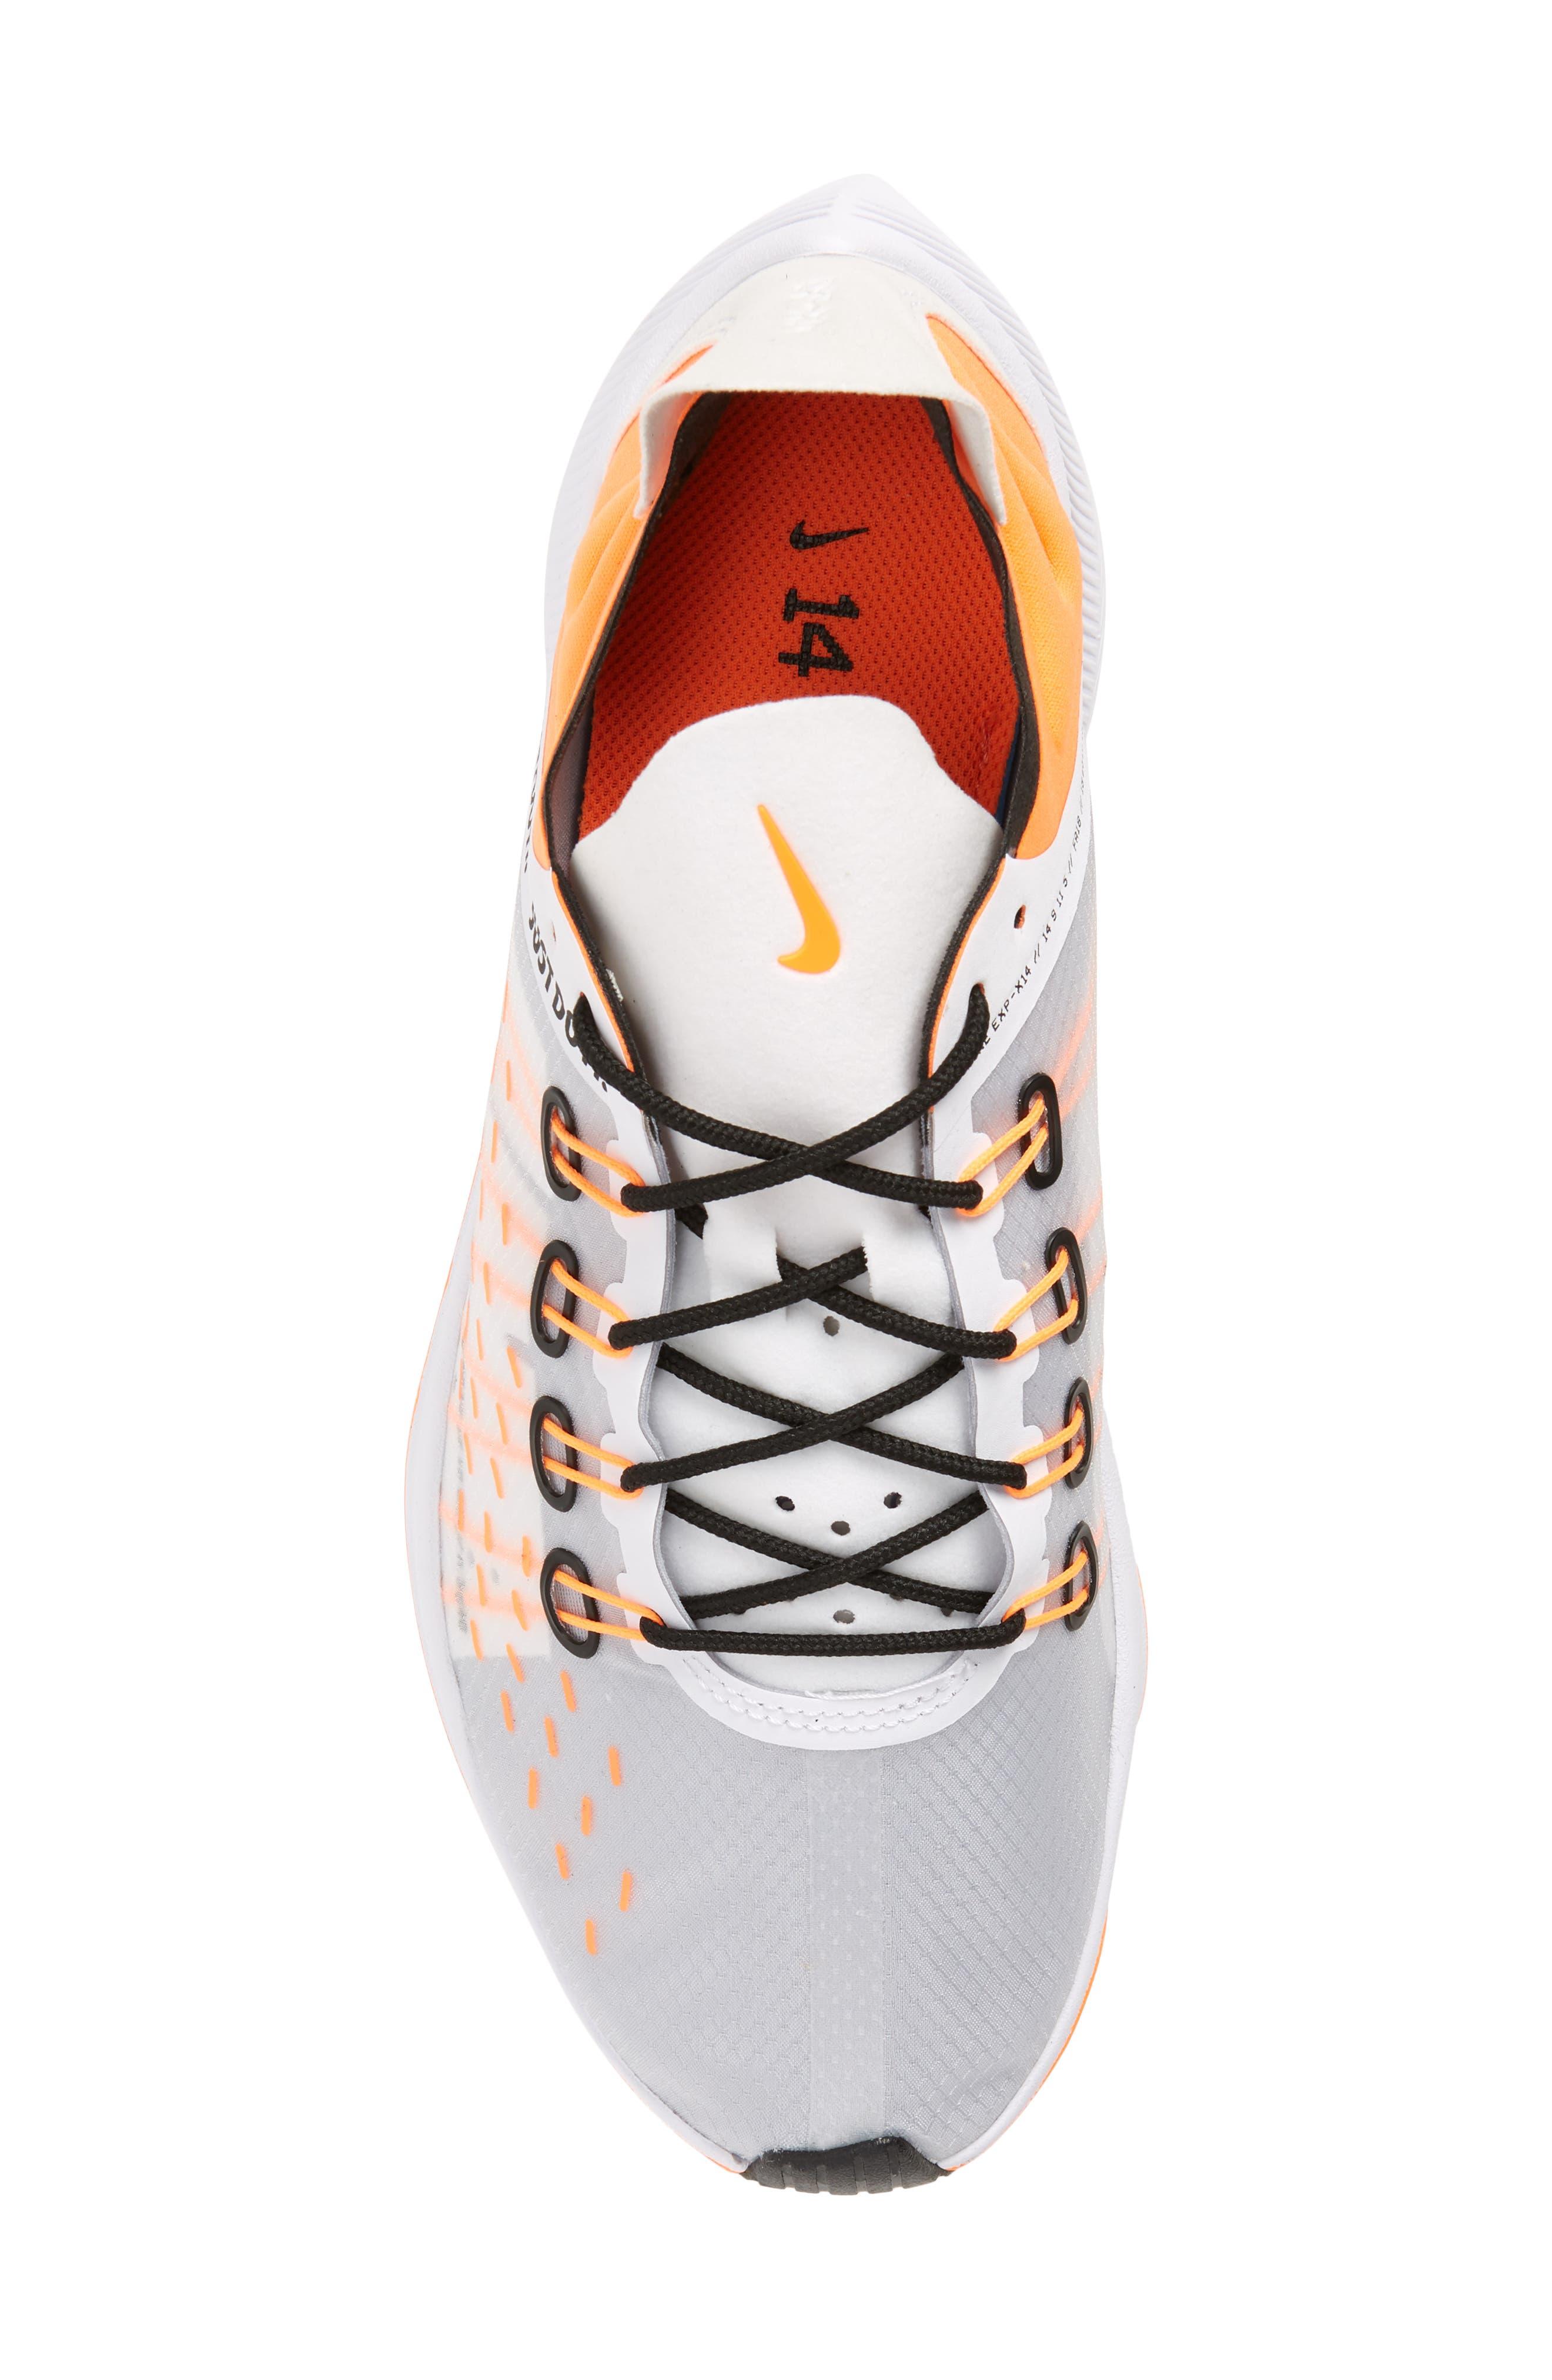 EXP-X14 Just Do It Sneaker,                             Alternate thumbnail 5, color,                             WHITE/ TOTAL ORANGE/ BLACK